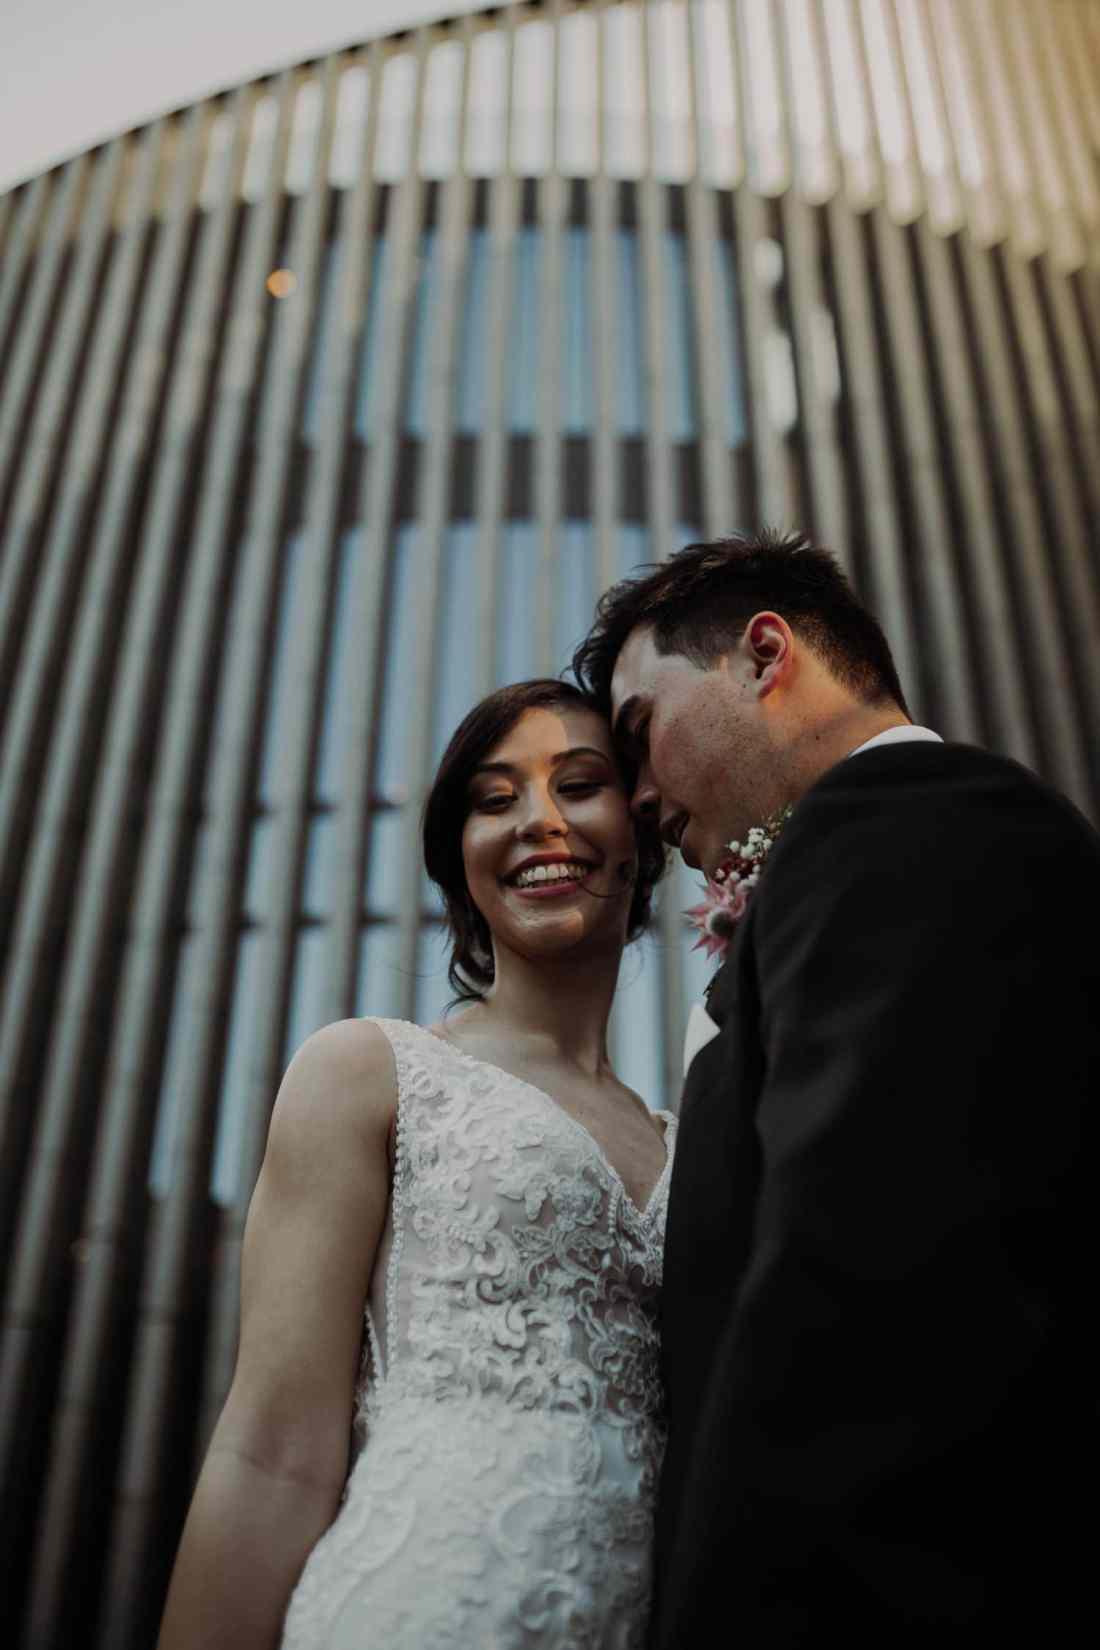 Ebony Blush Photography   Perth Wedding Photographer   Photography + Film   Sandalford Winery   Como Treasury Wedding   Perth City Wedding  Alex + Mel82